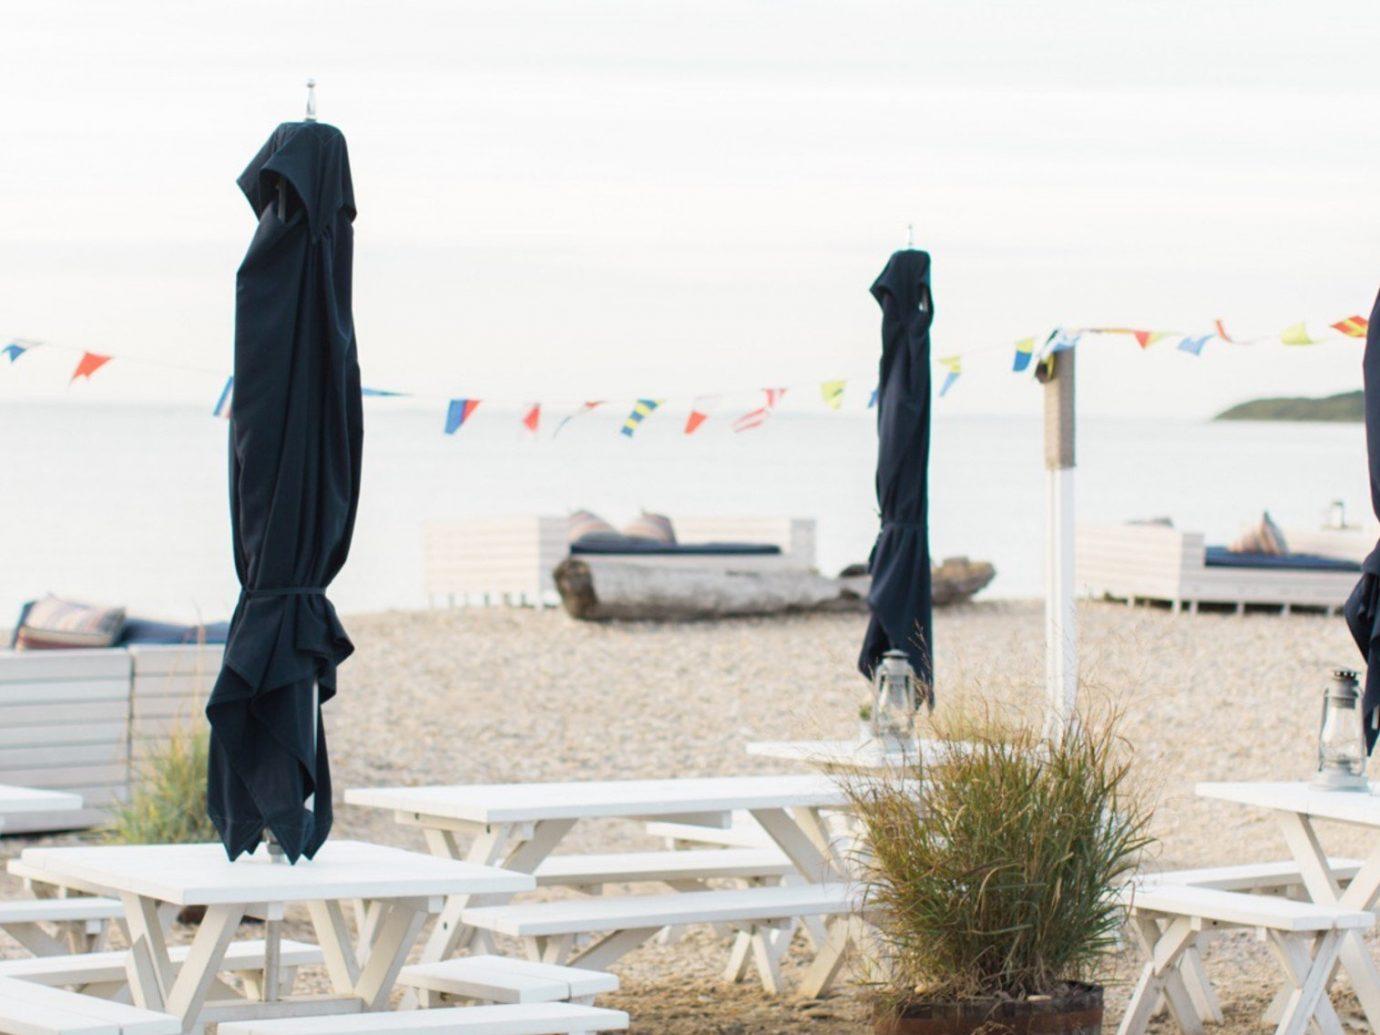 Style + Design sky outdoor Beach recreation vacation sand sandy day